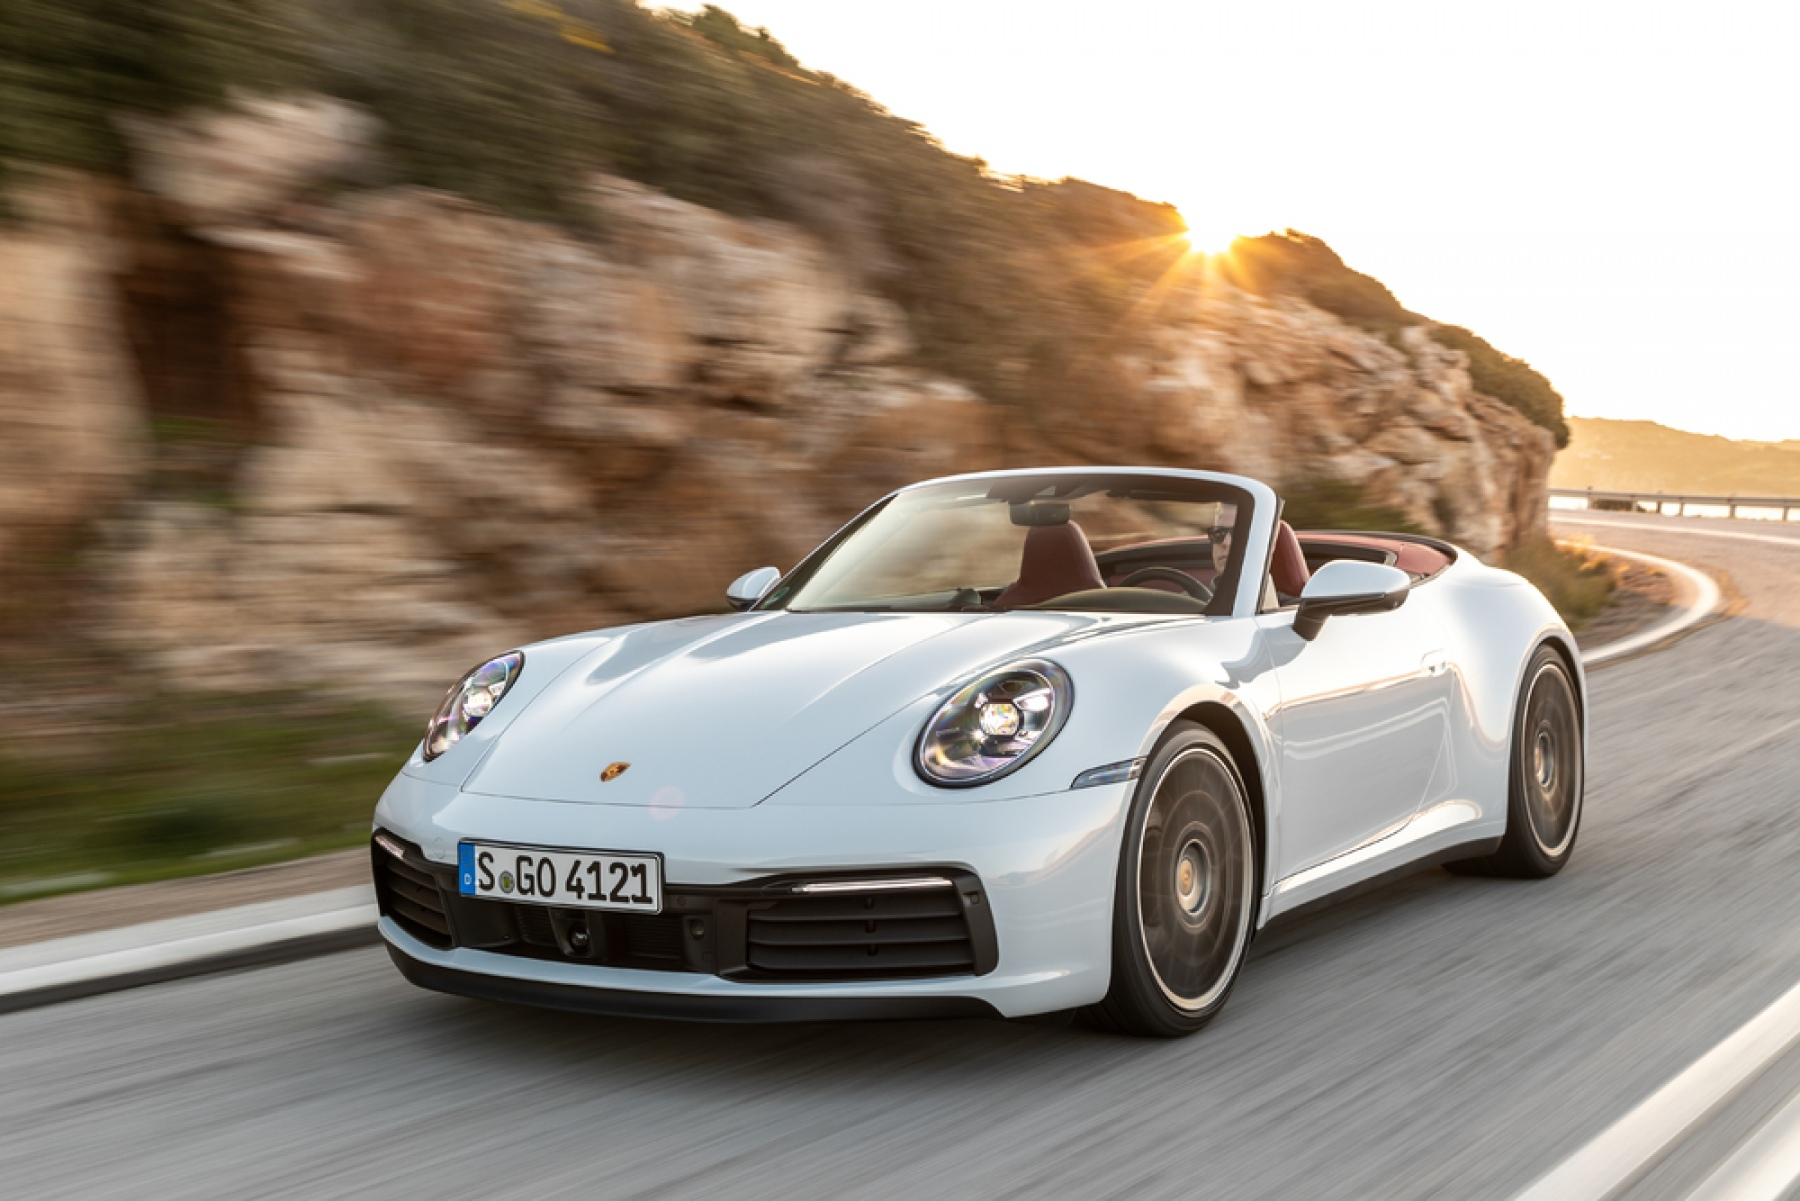 911 Carrera 4s Cabriolet Carrara White Metallic S Go 4121 O Porsche 911 Carrera Cabriolet